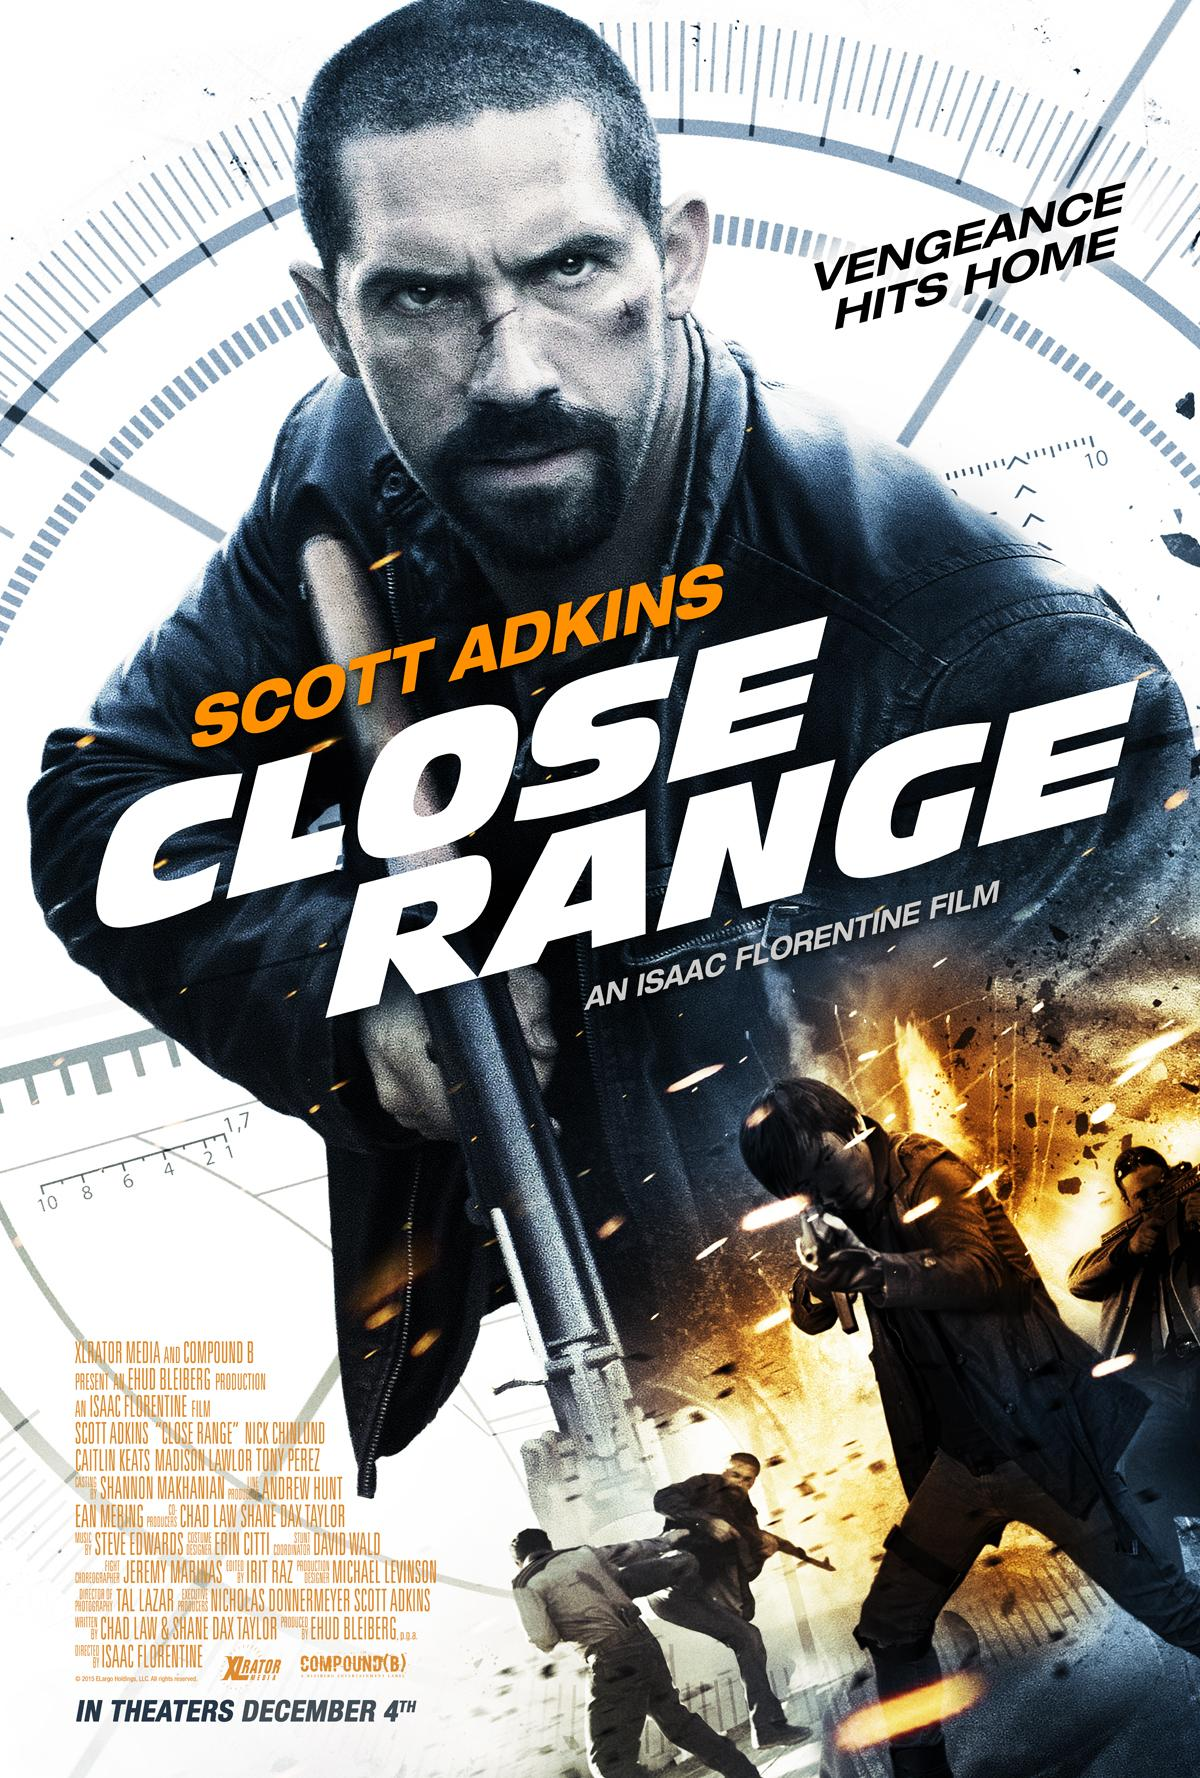 Close.Range.2015.720p.BluRay.DD5.1.x264.HuN-No1